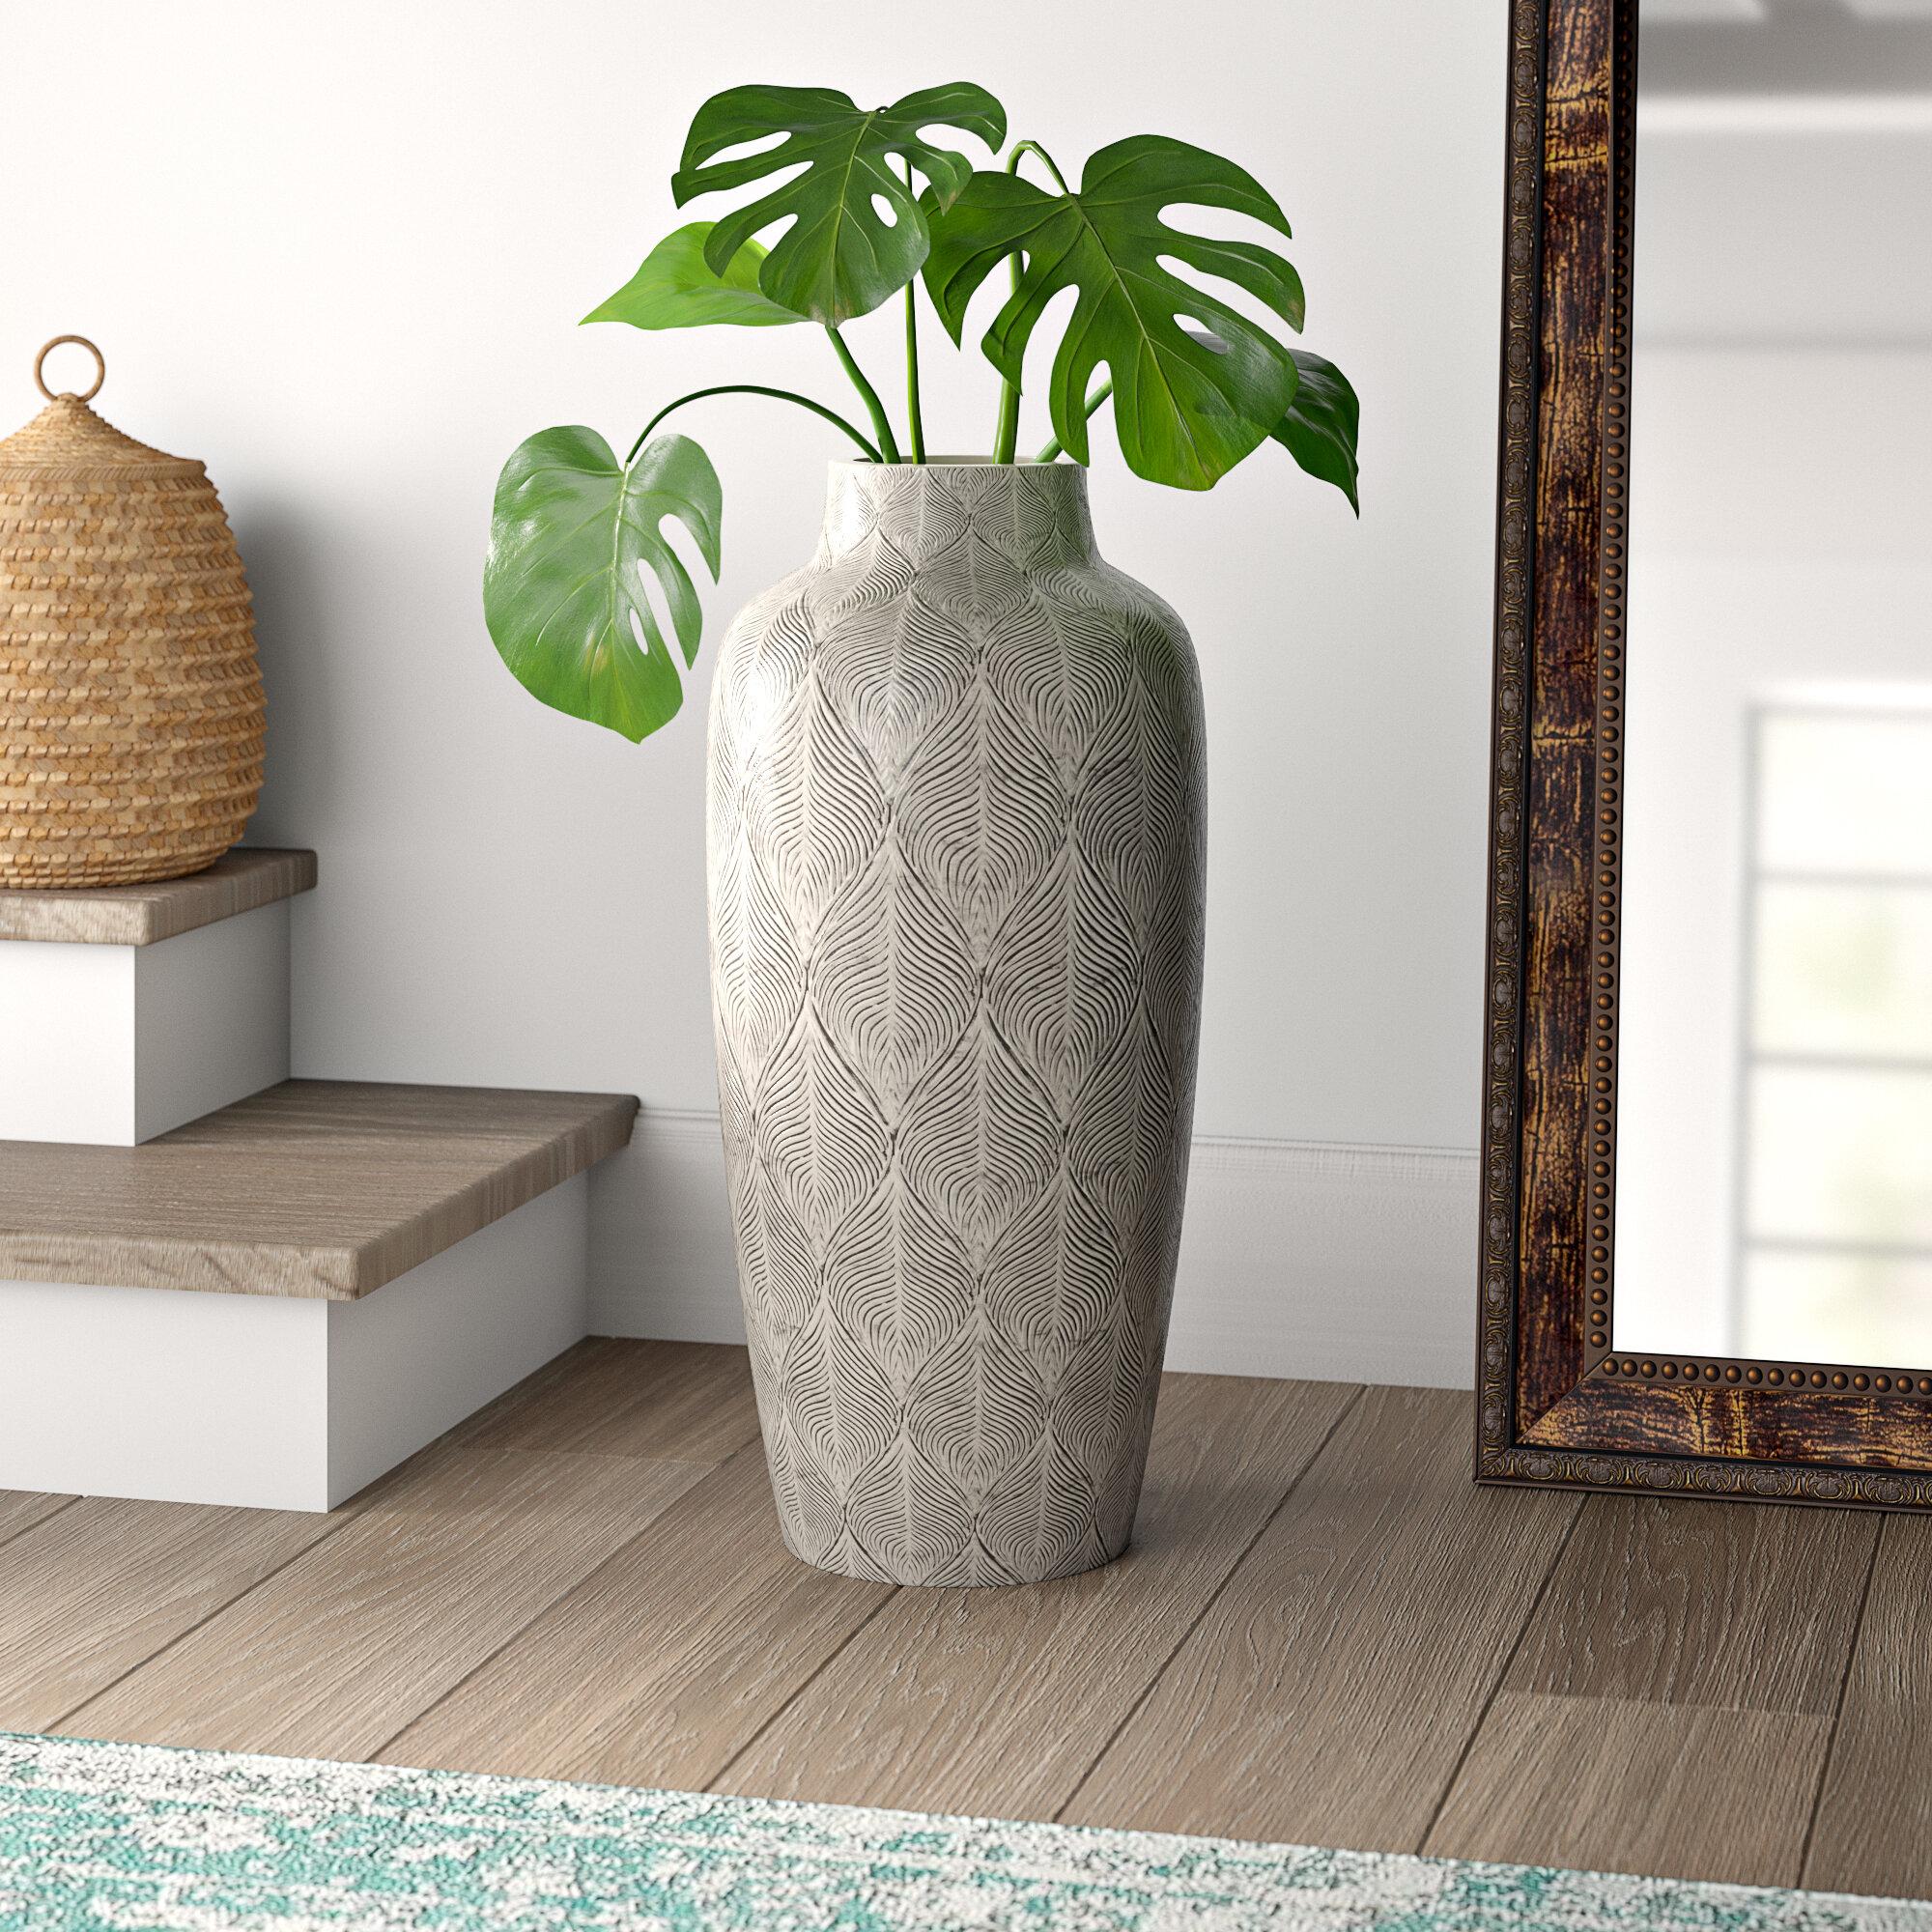 Adda Feathered Oversize Floor Vase